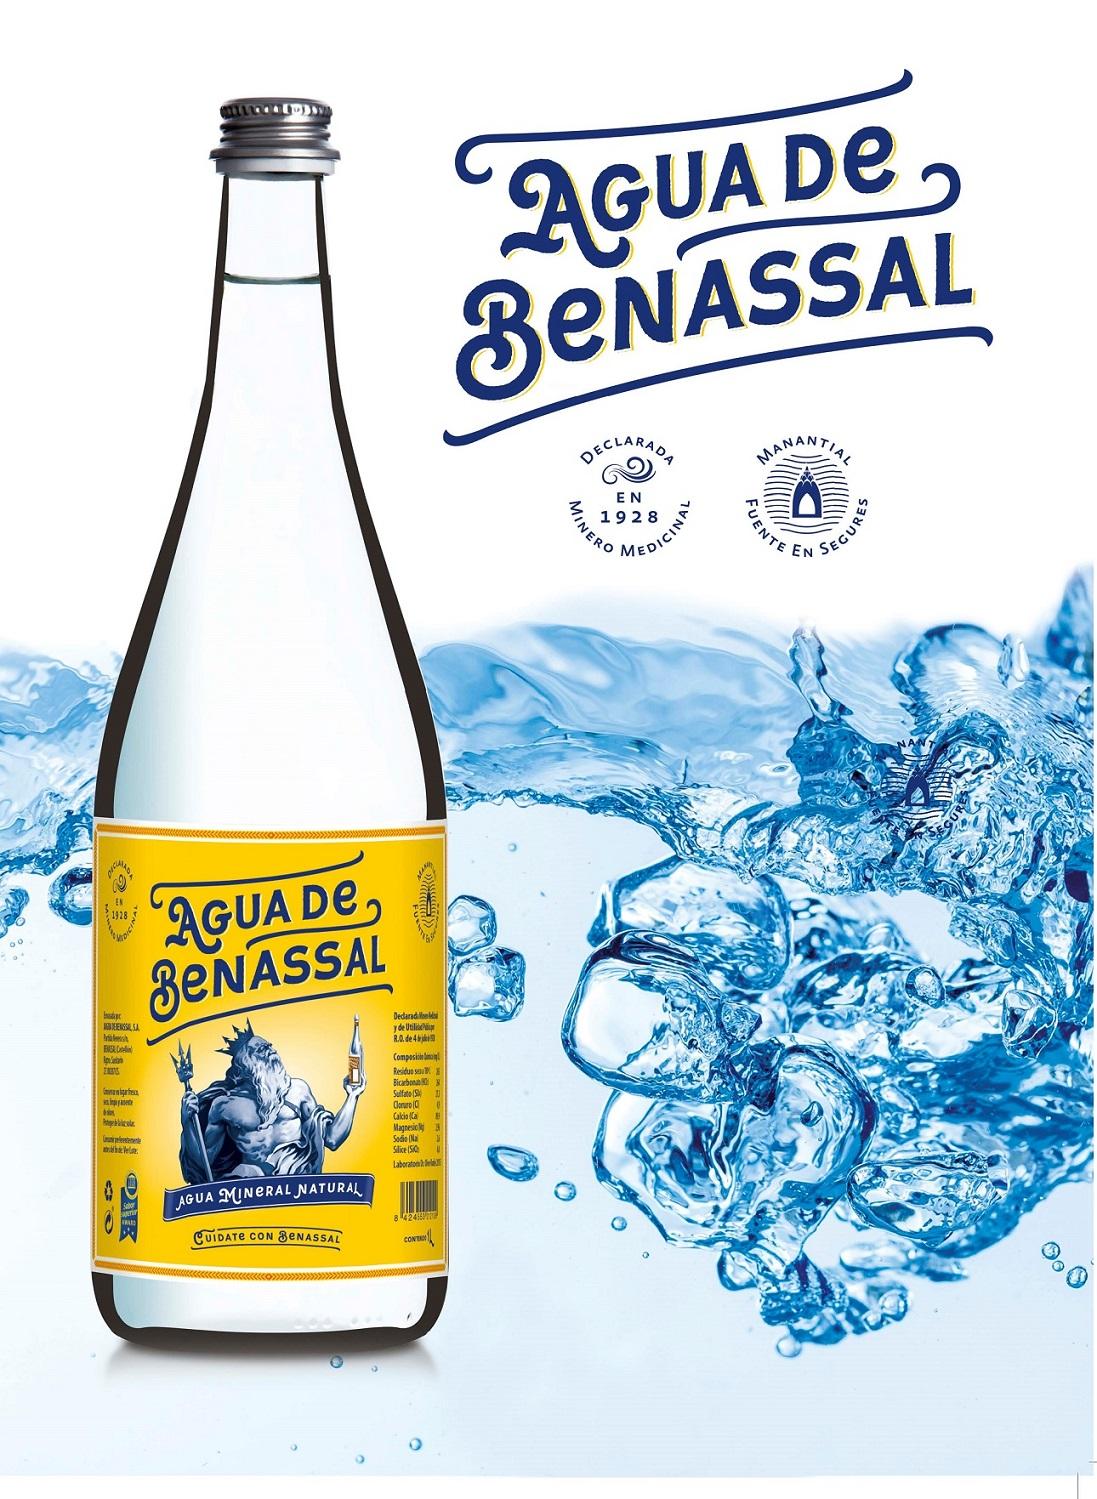 Nueva imagen para resaltar el origen de Agua de Benassal